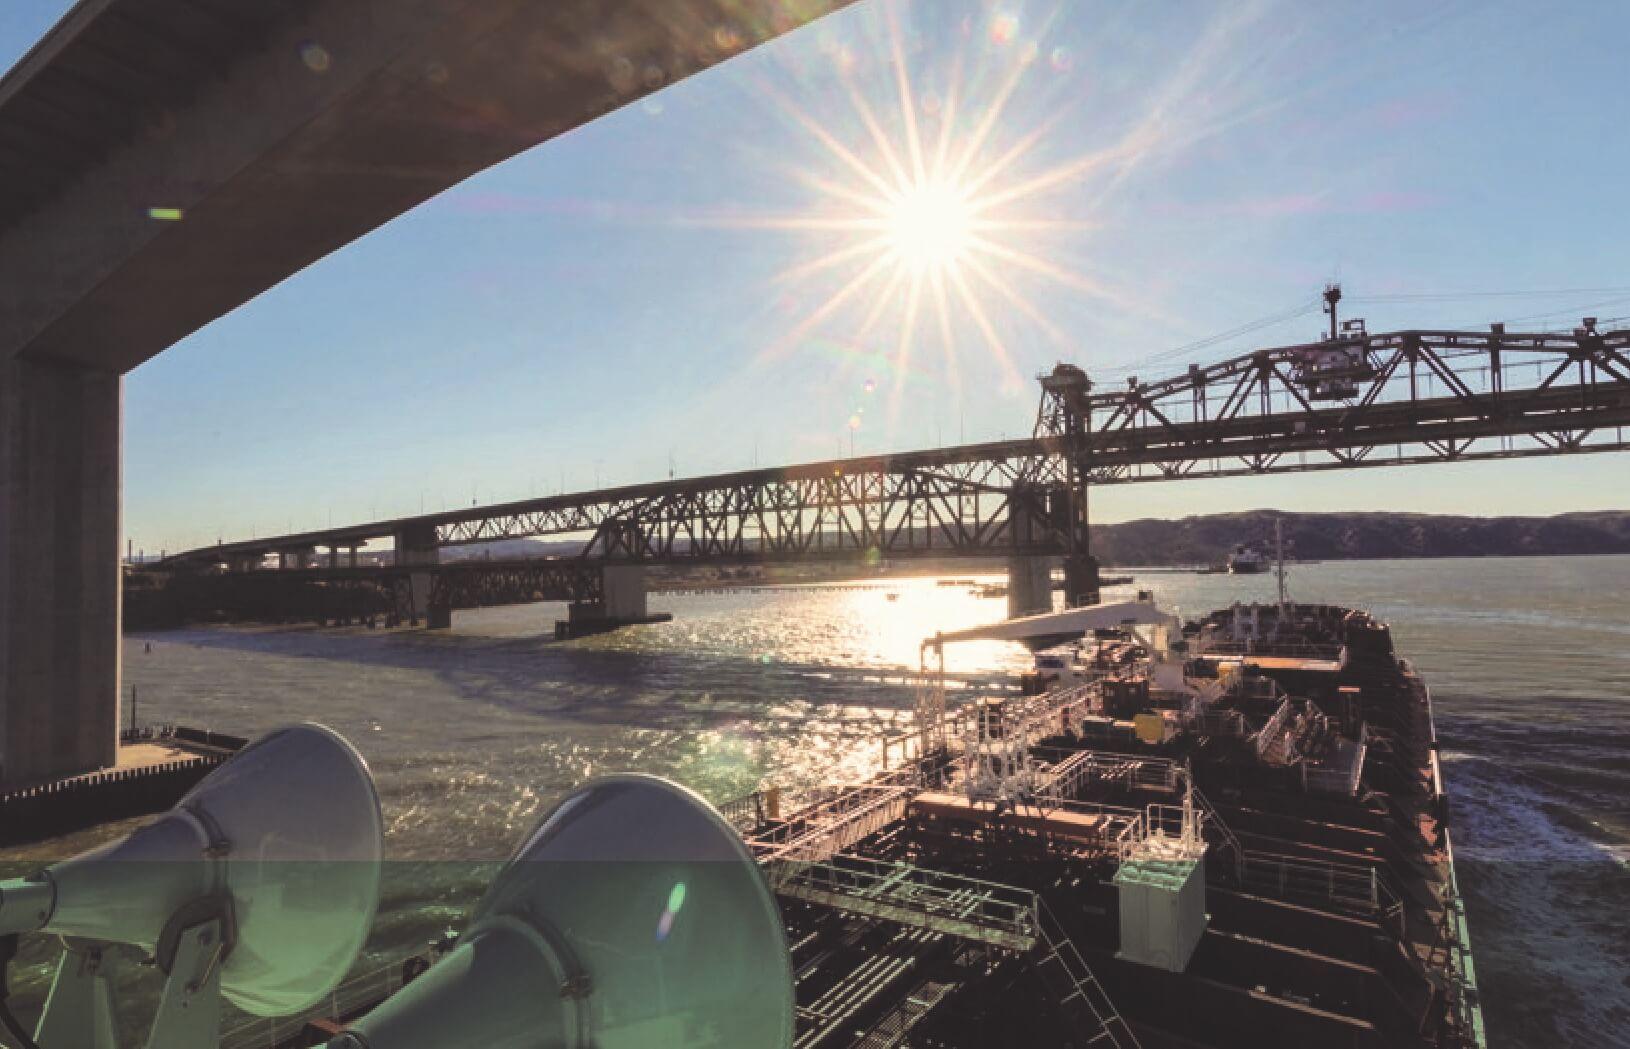 ICS Launches Free Guidance on Preparing for 2020 Sulphur Cap